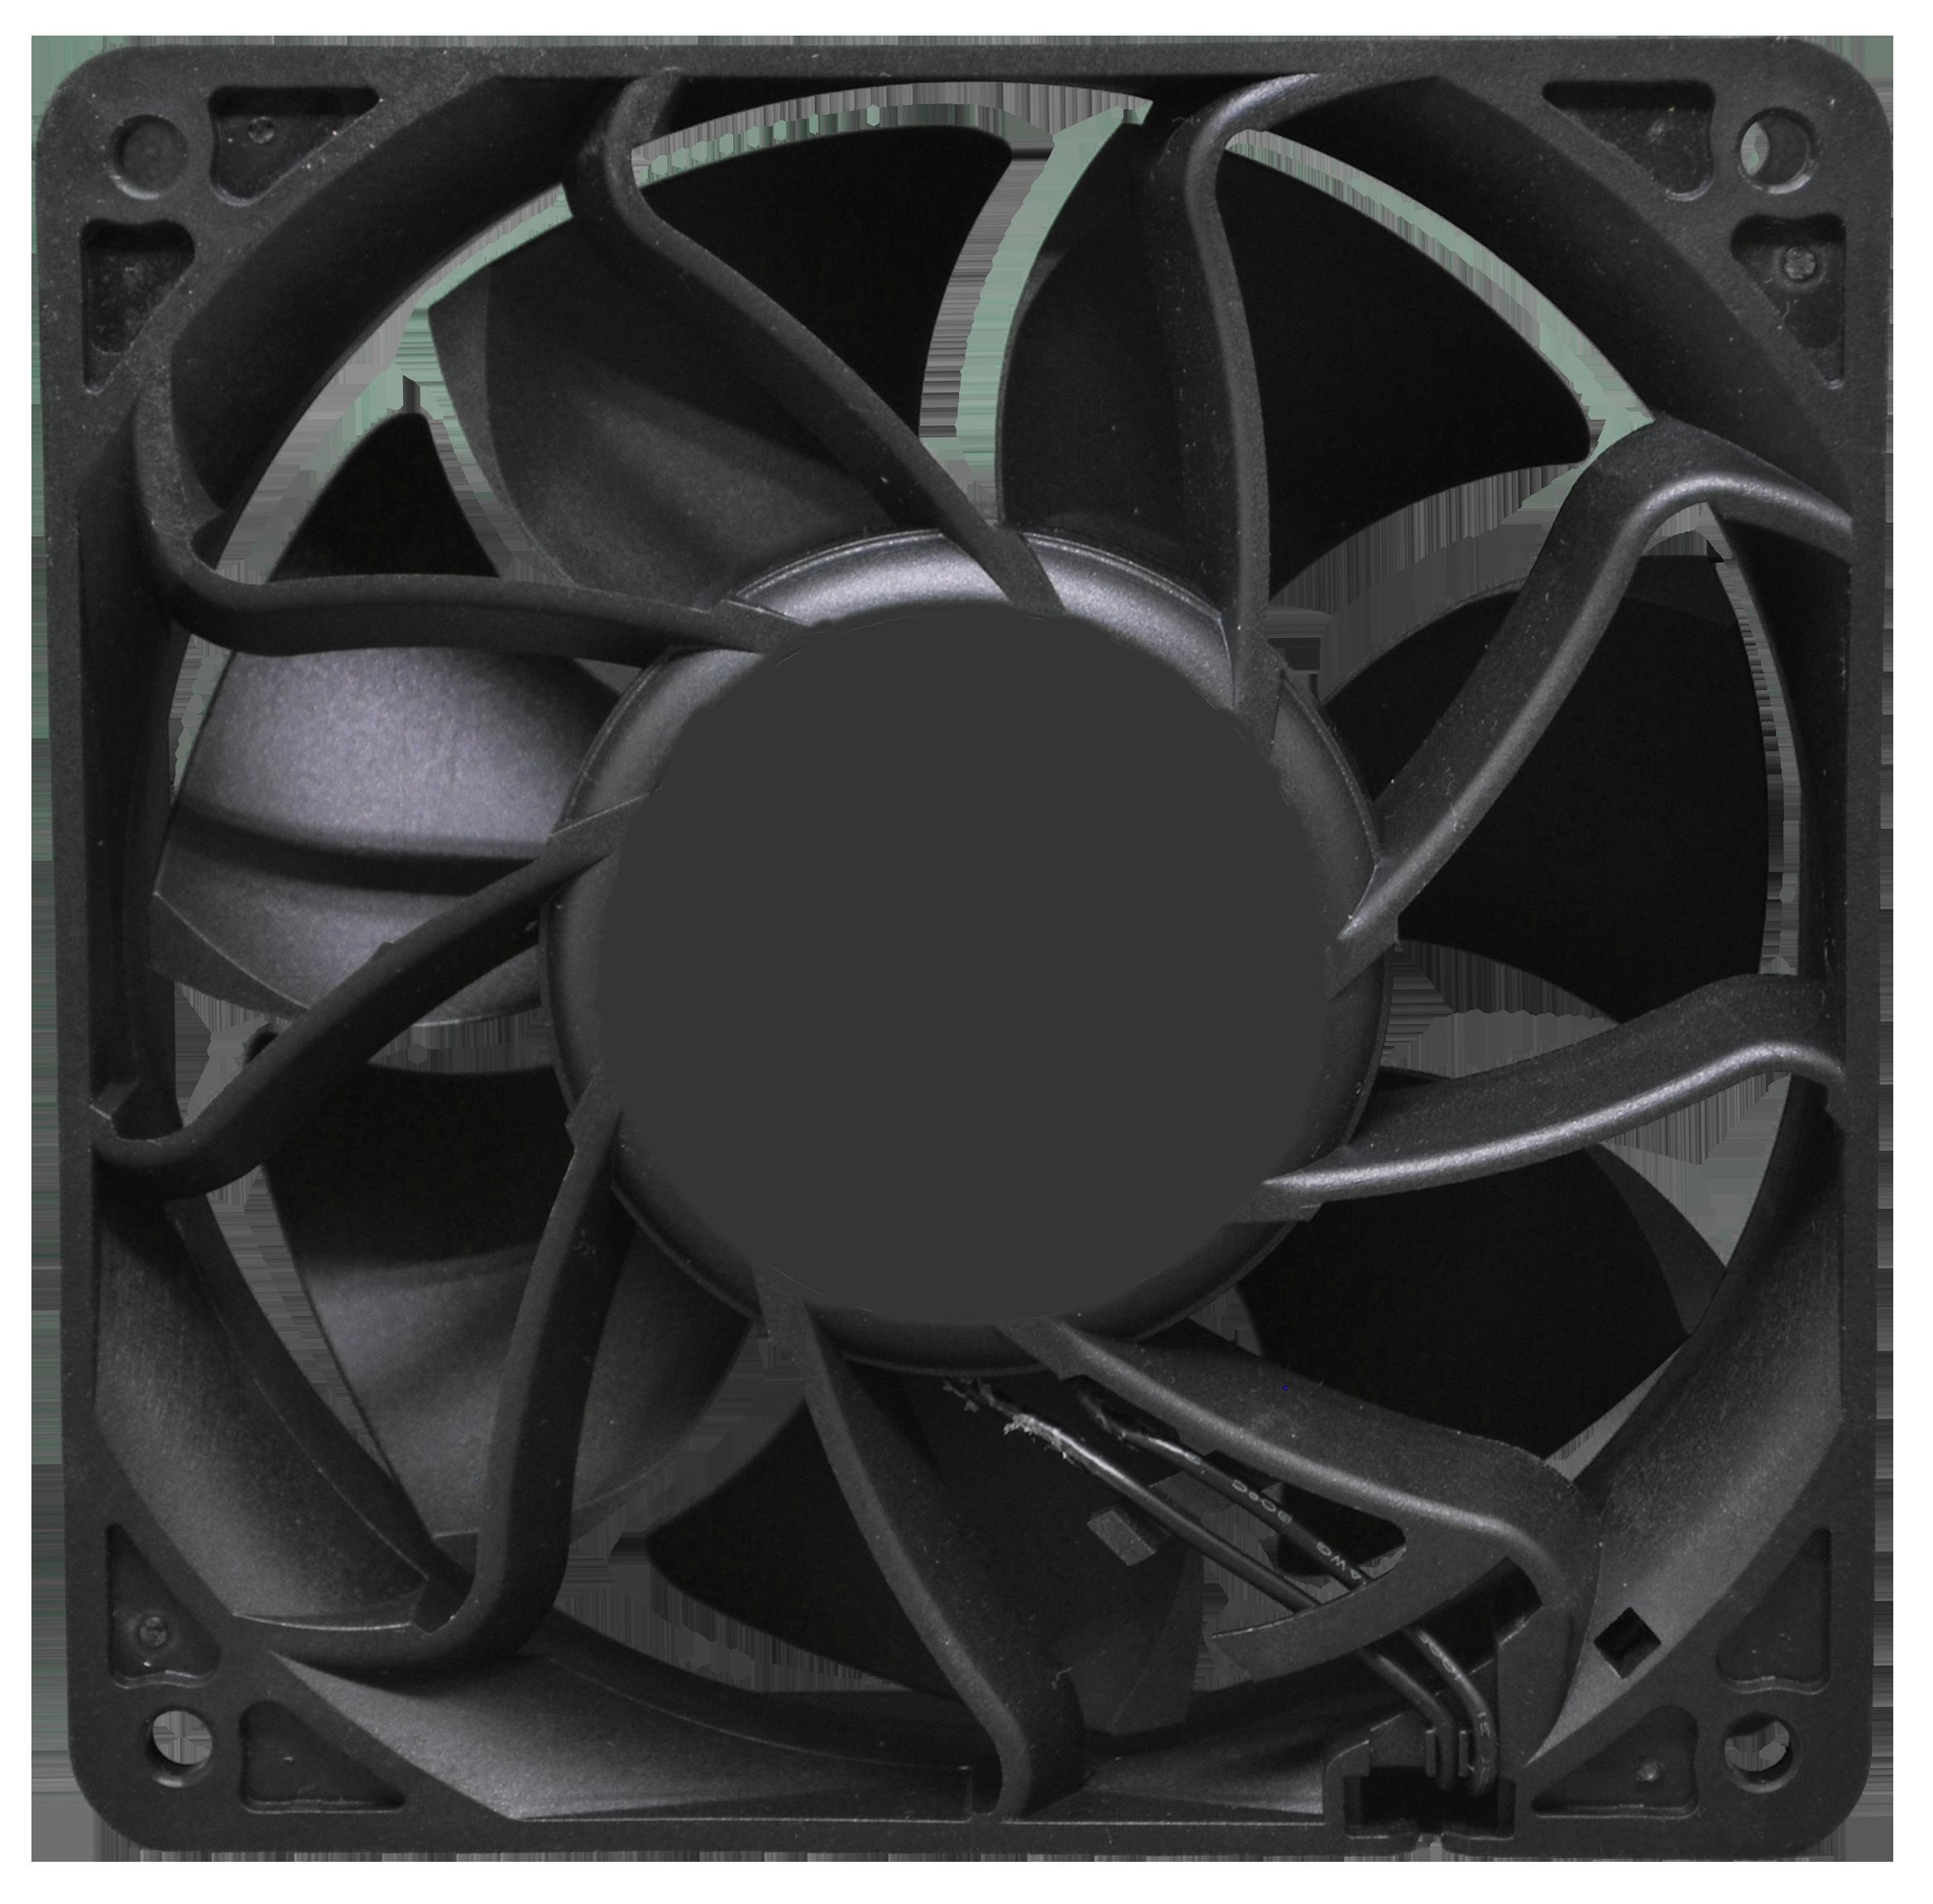 Compact fan VCT